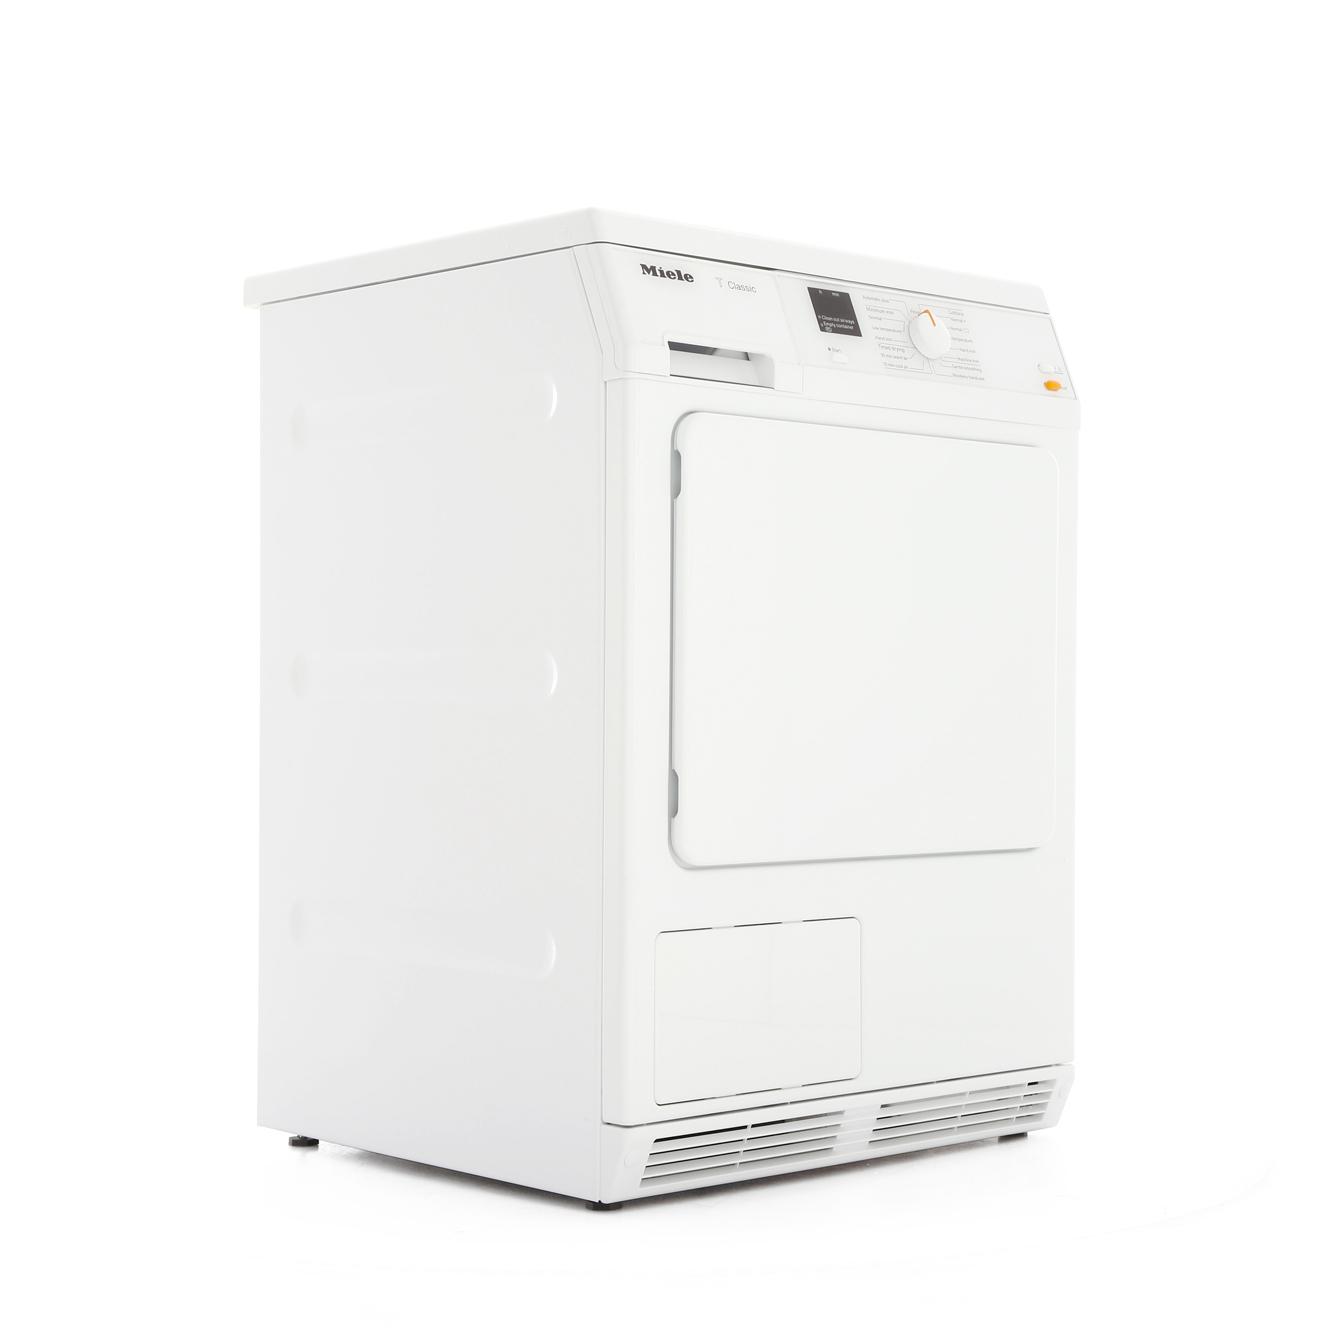 Miele Classic TDA150C Condenser Dryer